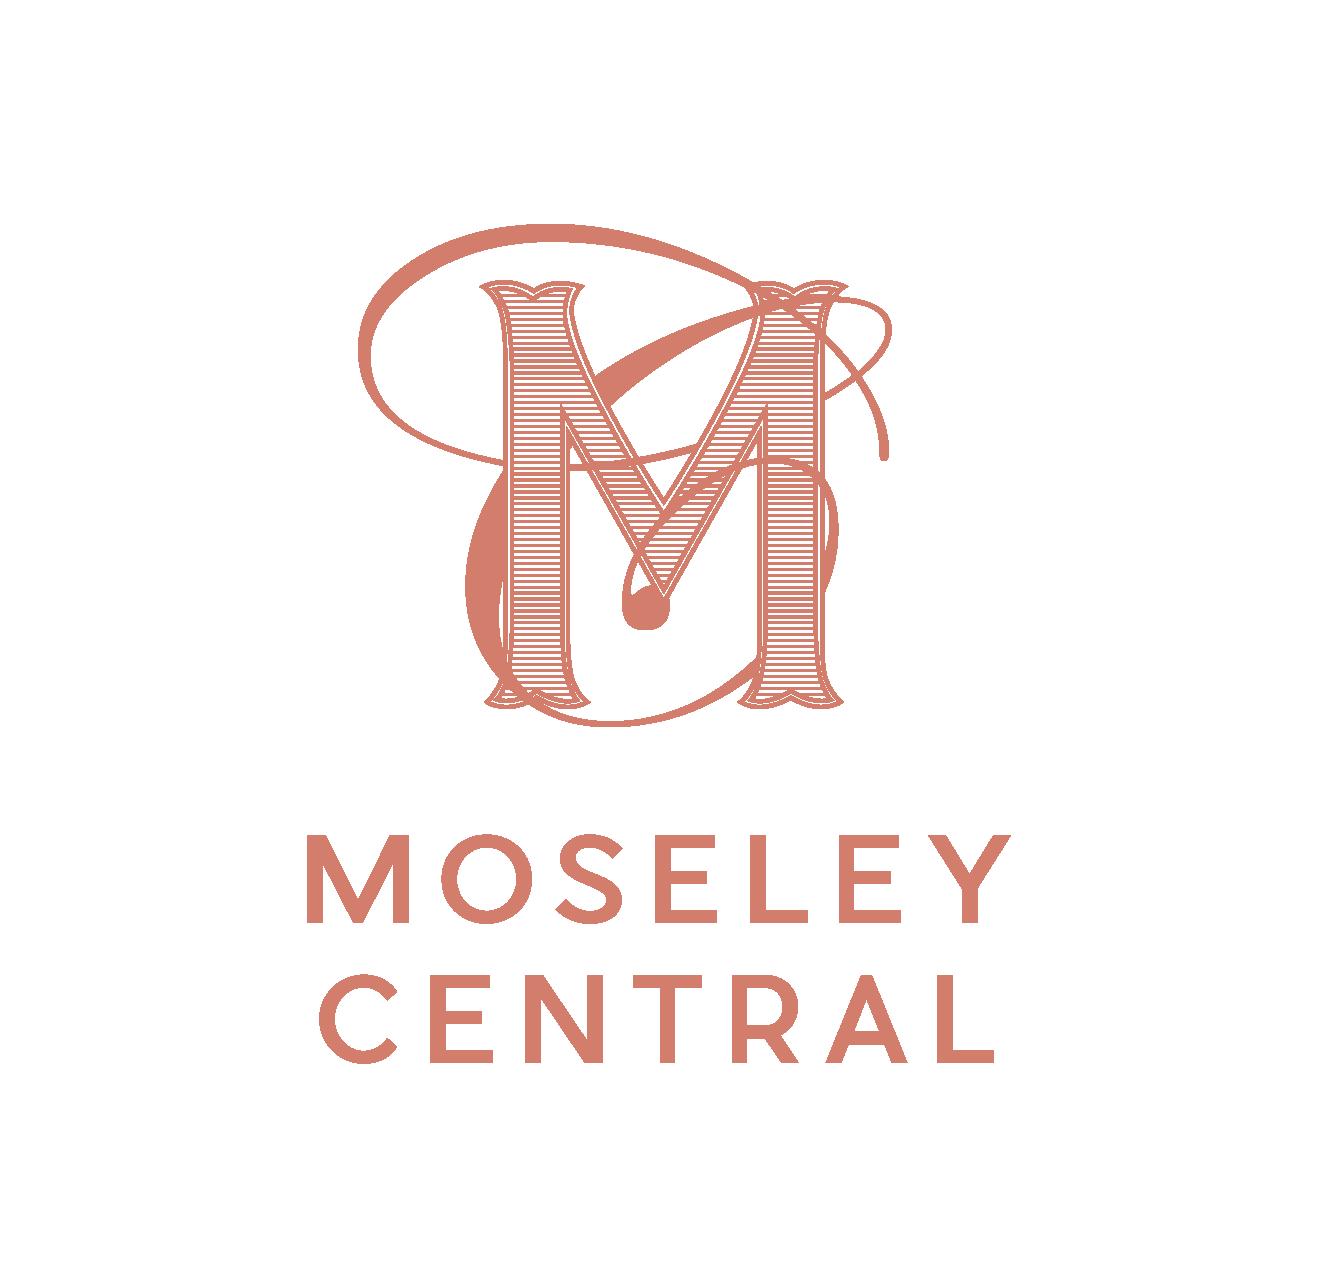 Moseley Central, Moseley, Birmingham